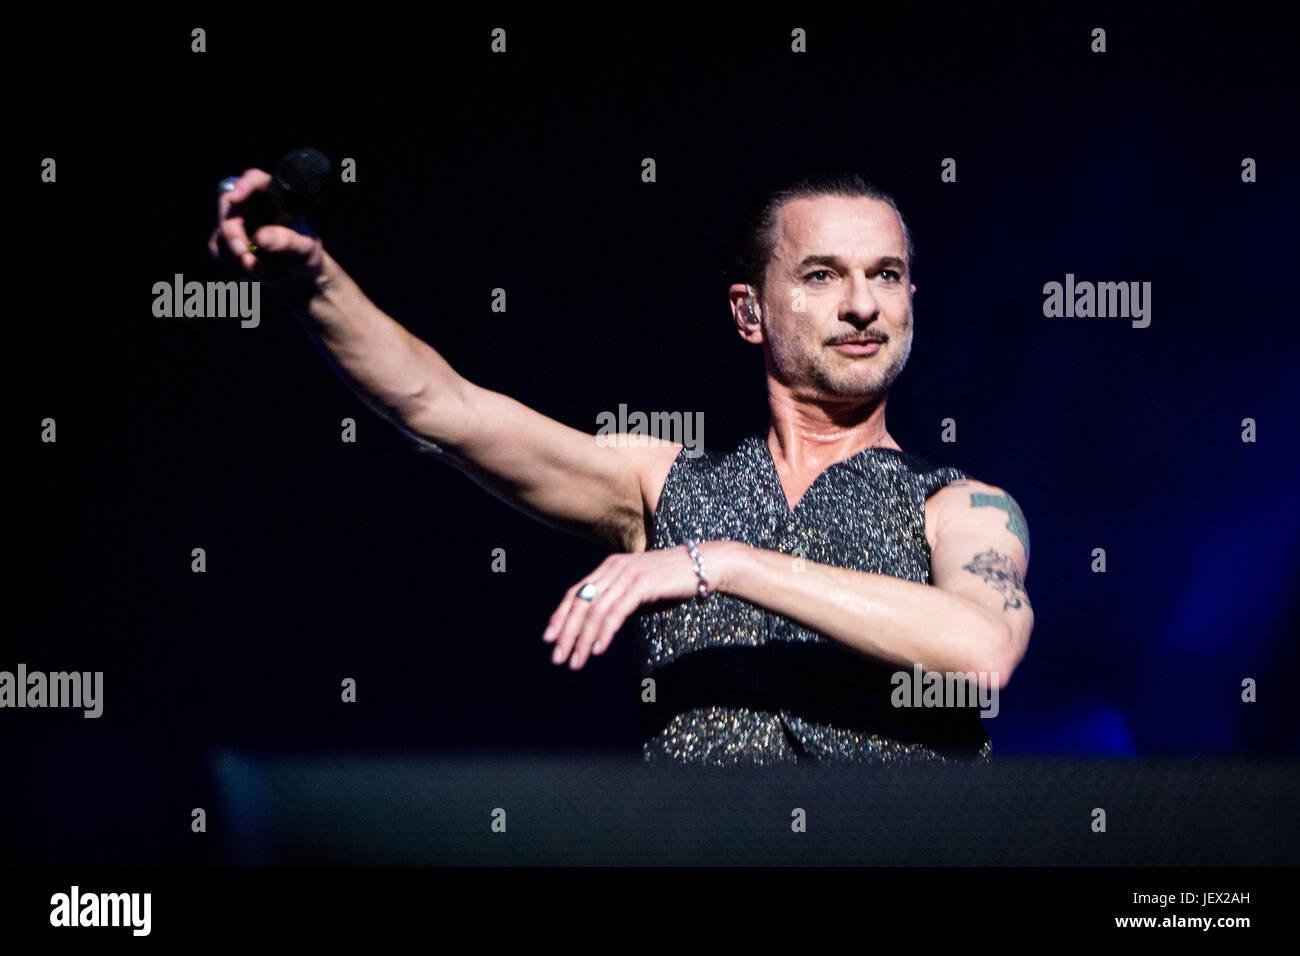 Milan, Italy 27th june Depeche Mode live at San Siro Stadium in Milan © Roberto Finizio / Alamy Live News Stock Photo